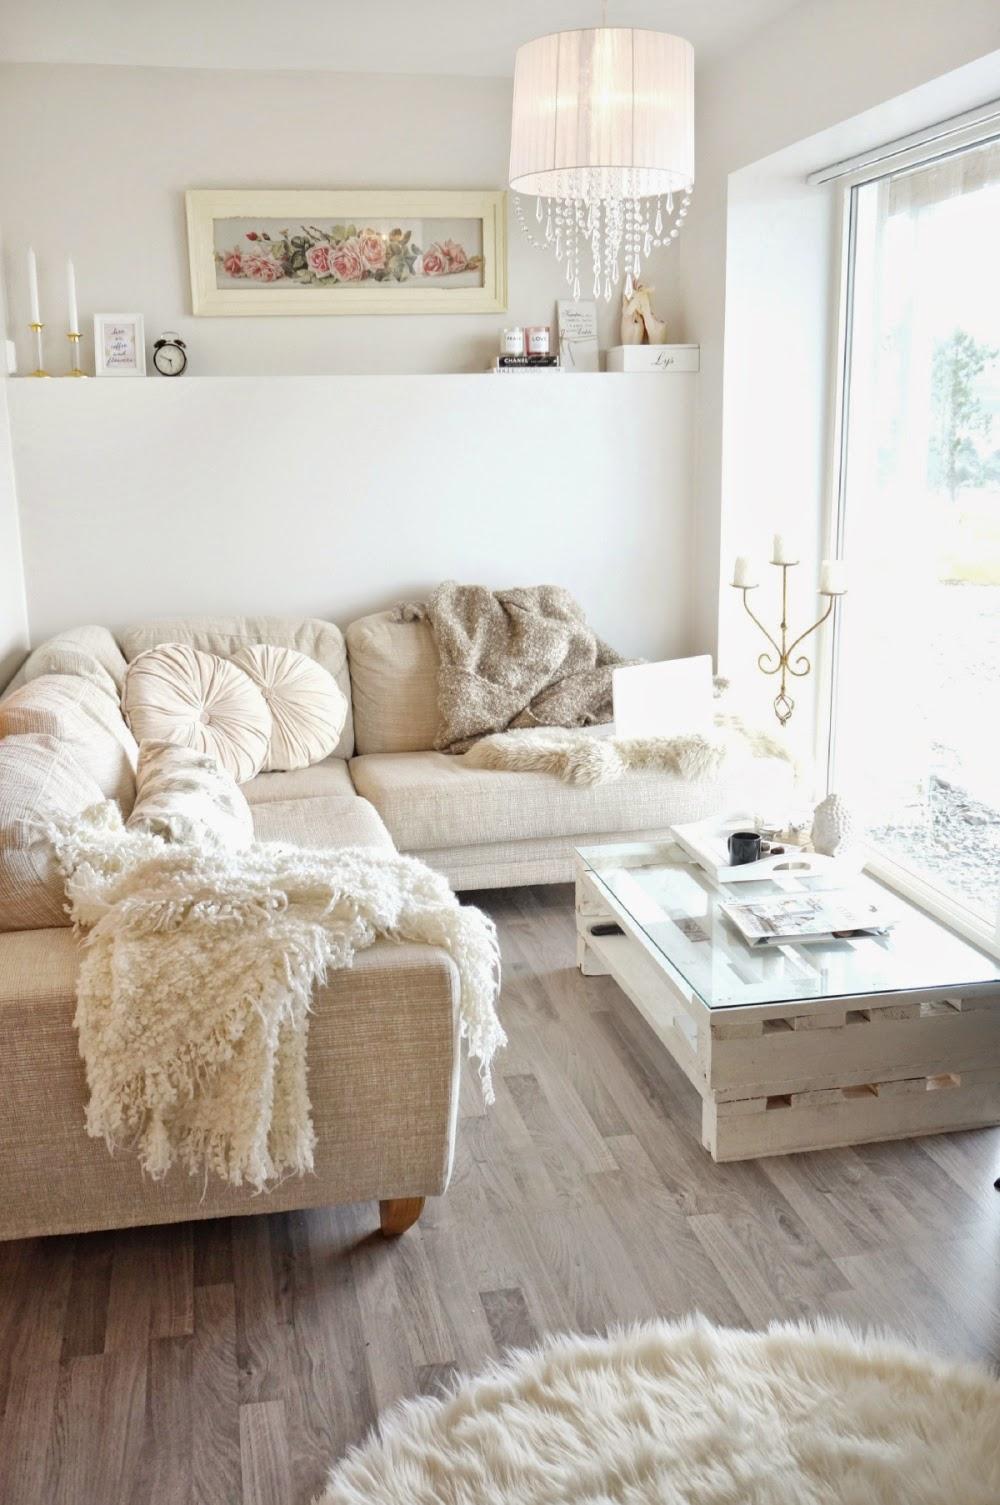 50 Small Living Room Ideas thewowdecor (29)